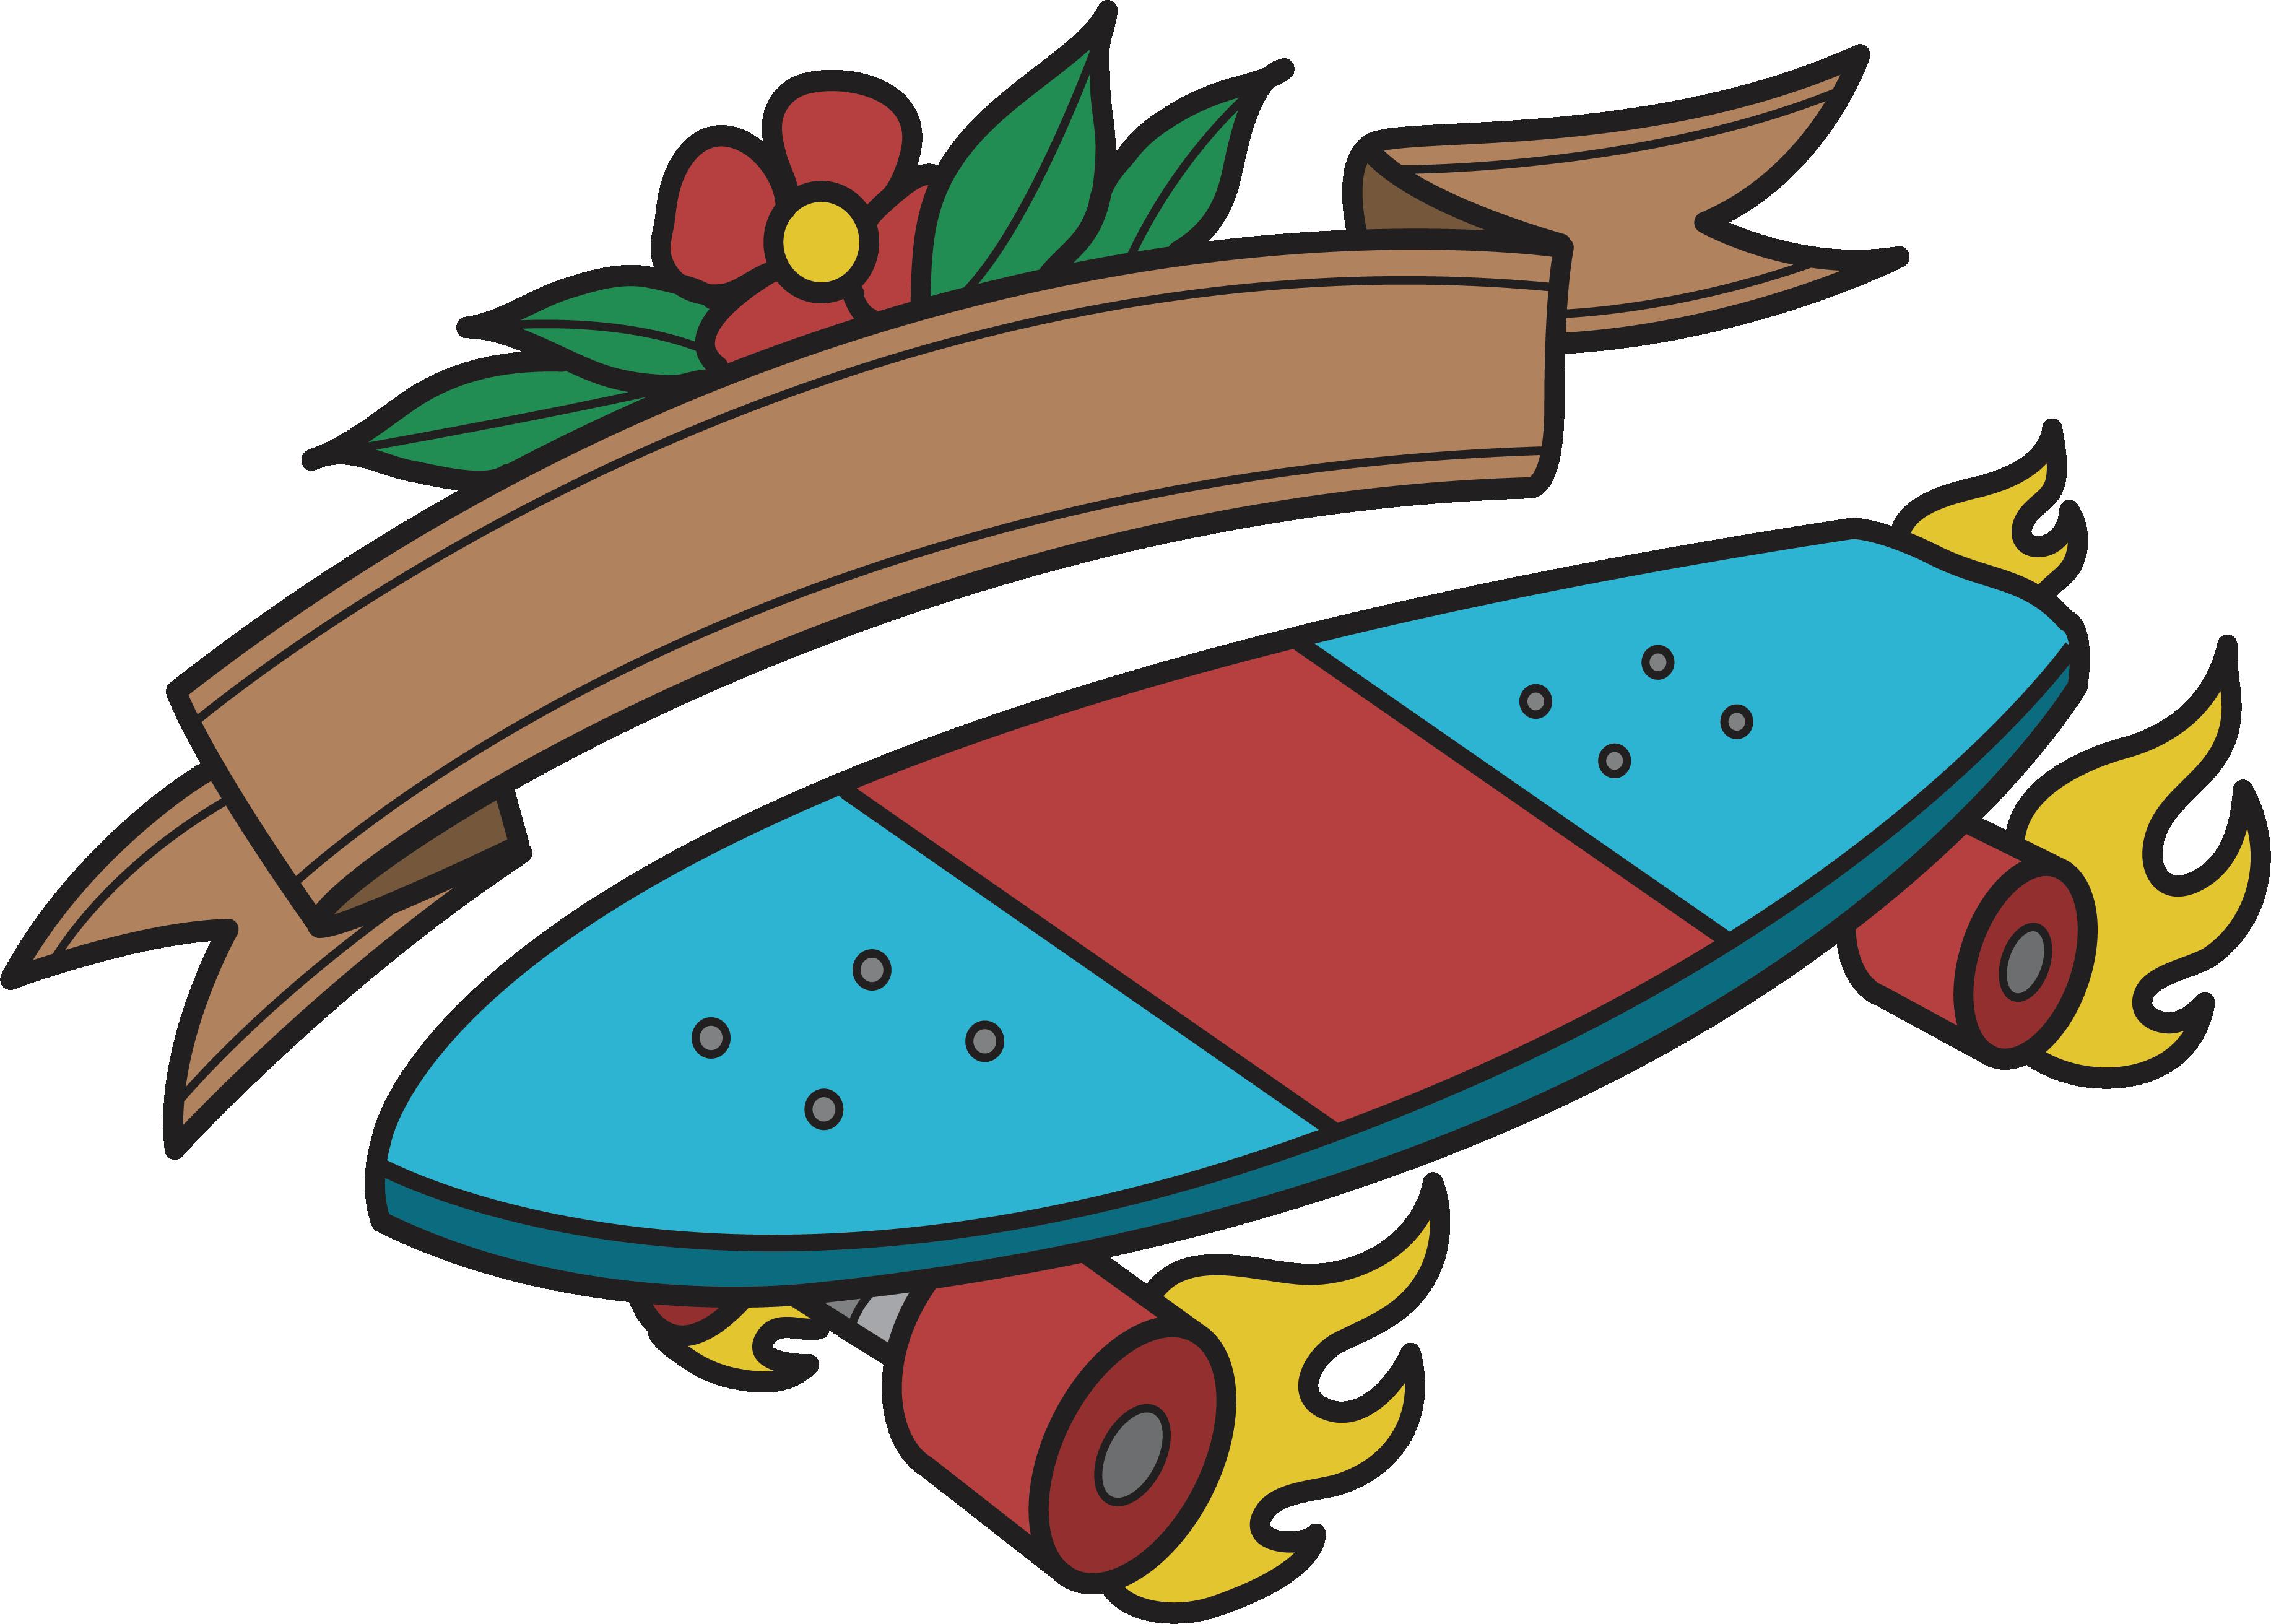 Skate or die skateboarding. Pennies clipart different kind